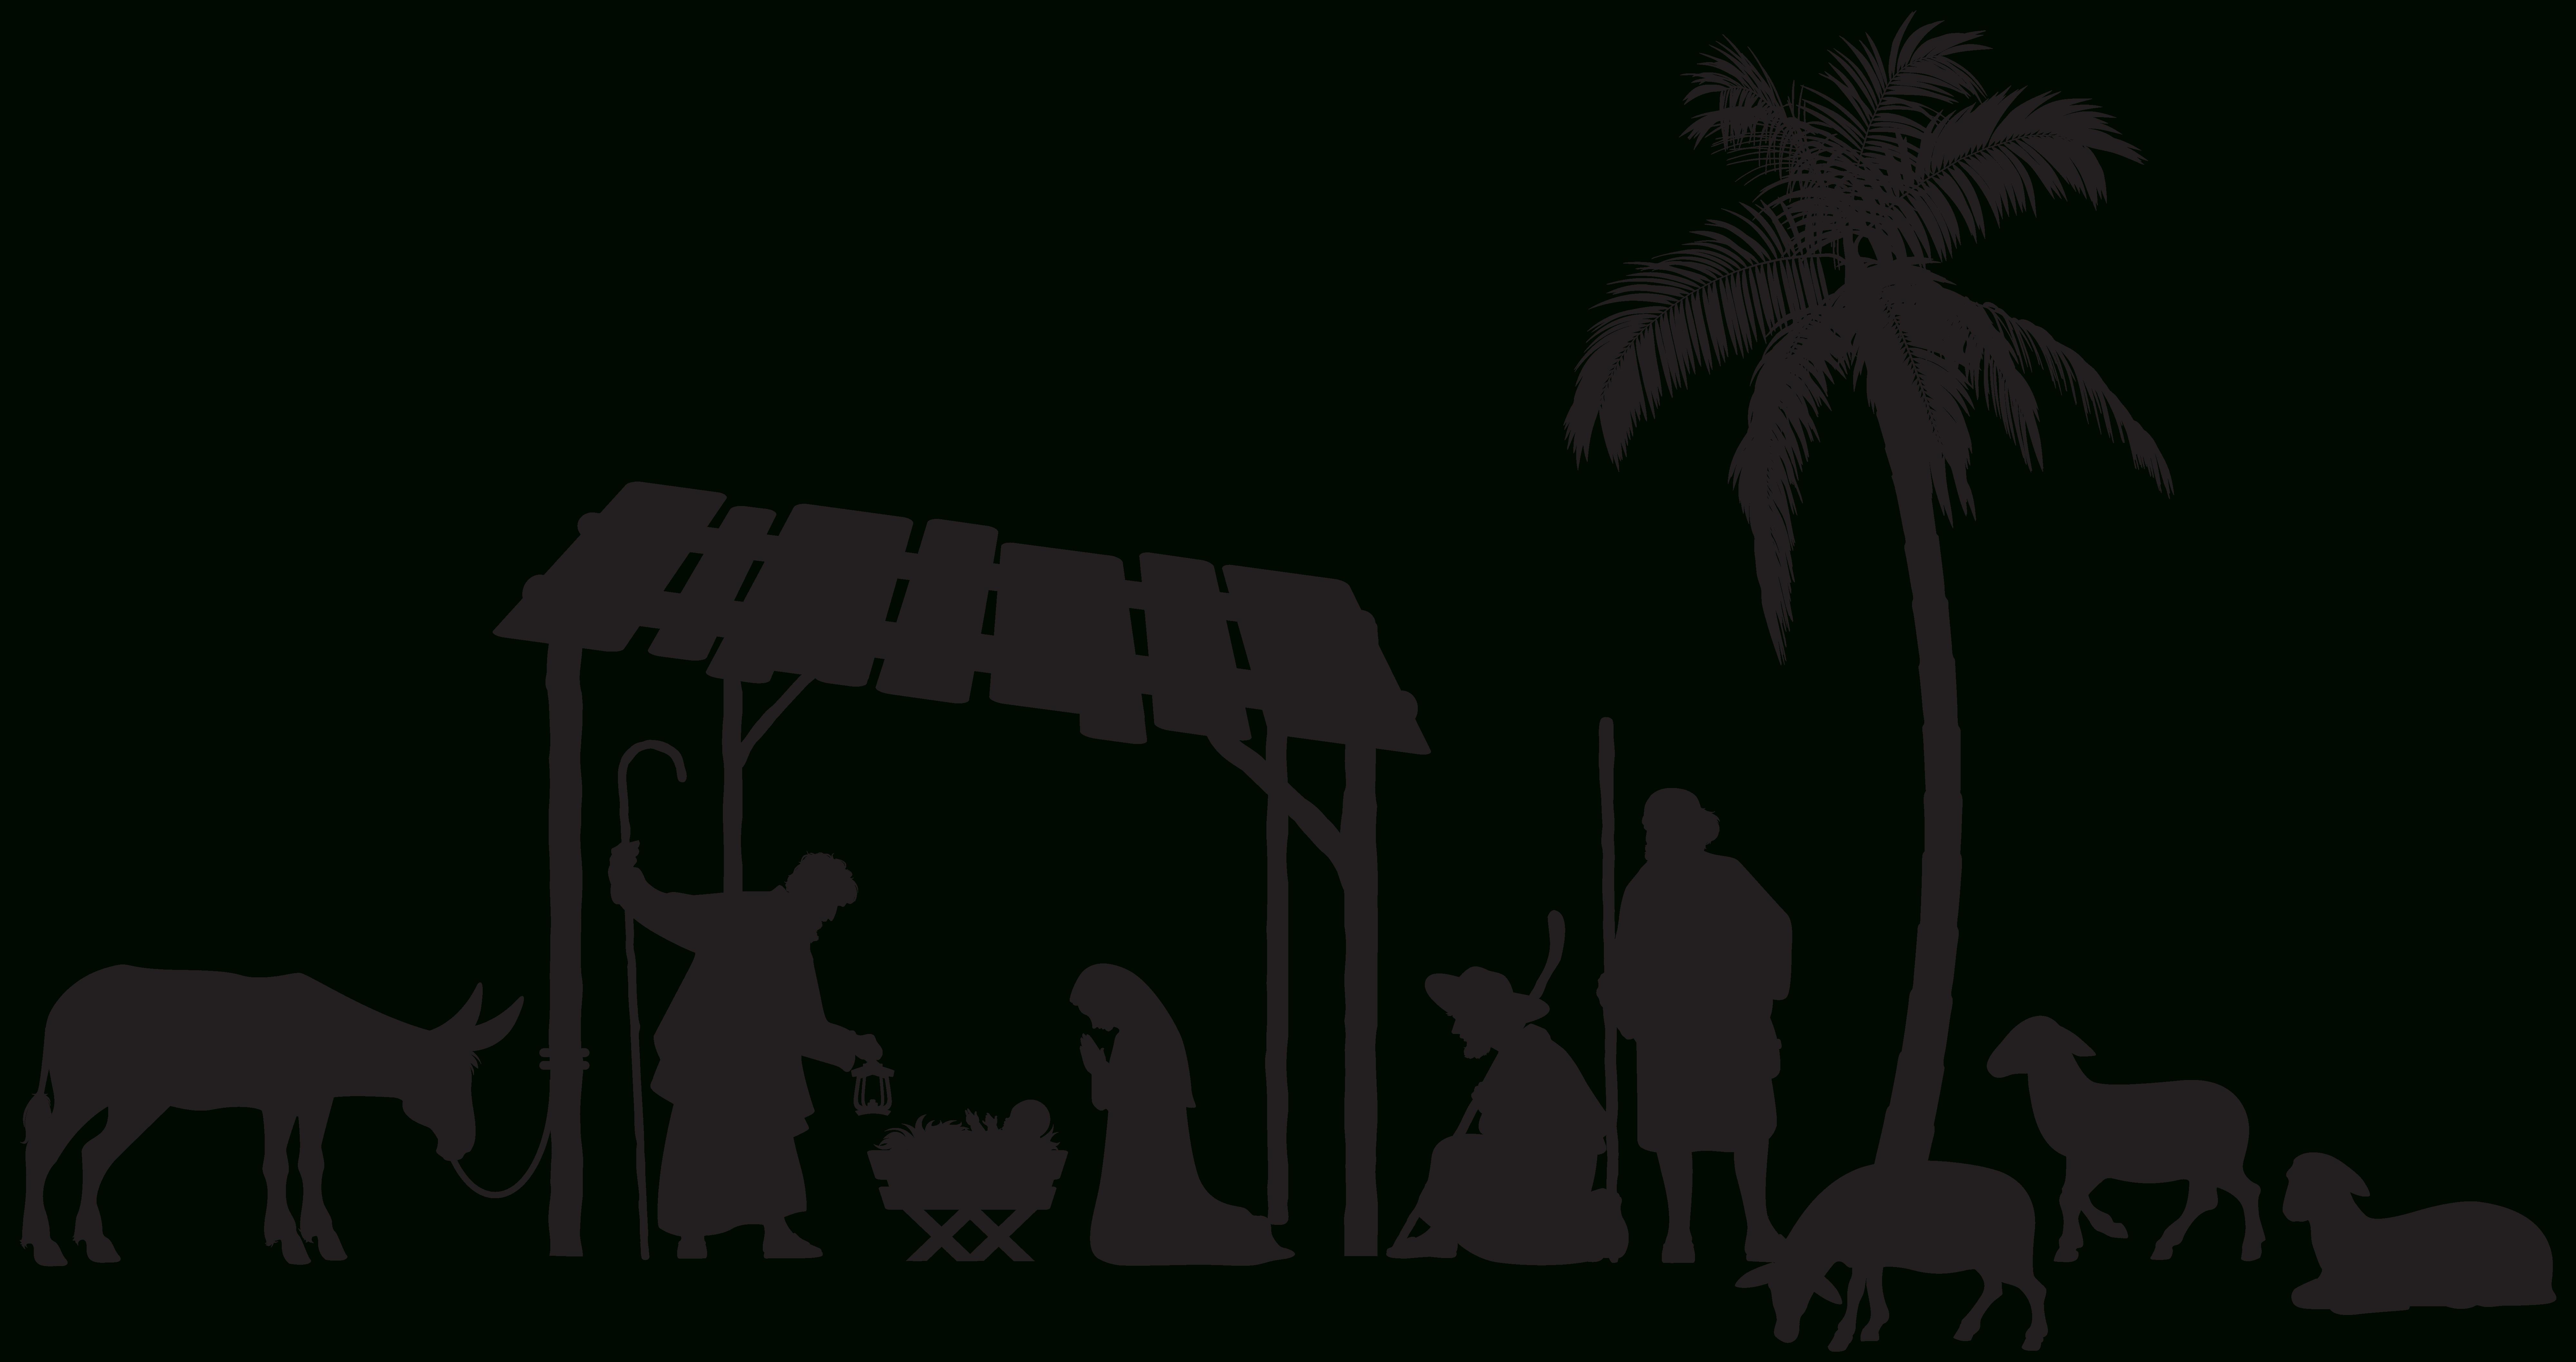 Pinalonso Cornejo On Figuras De Madera | Nativity Scene Pictures - Free Printable Nativity Silhouette